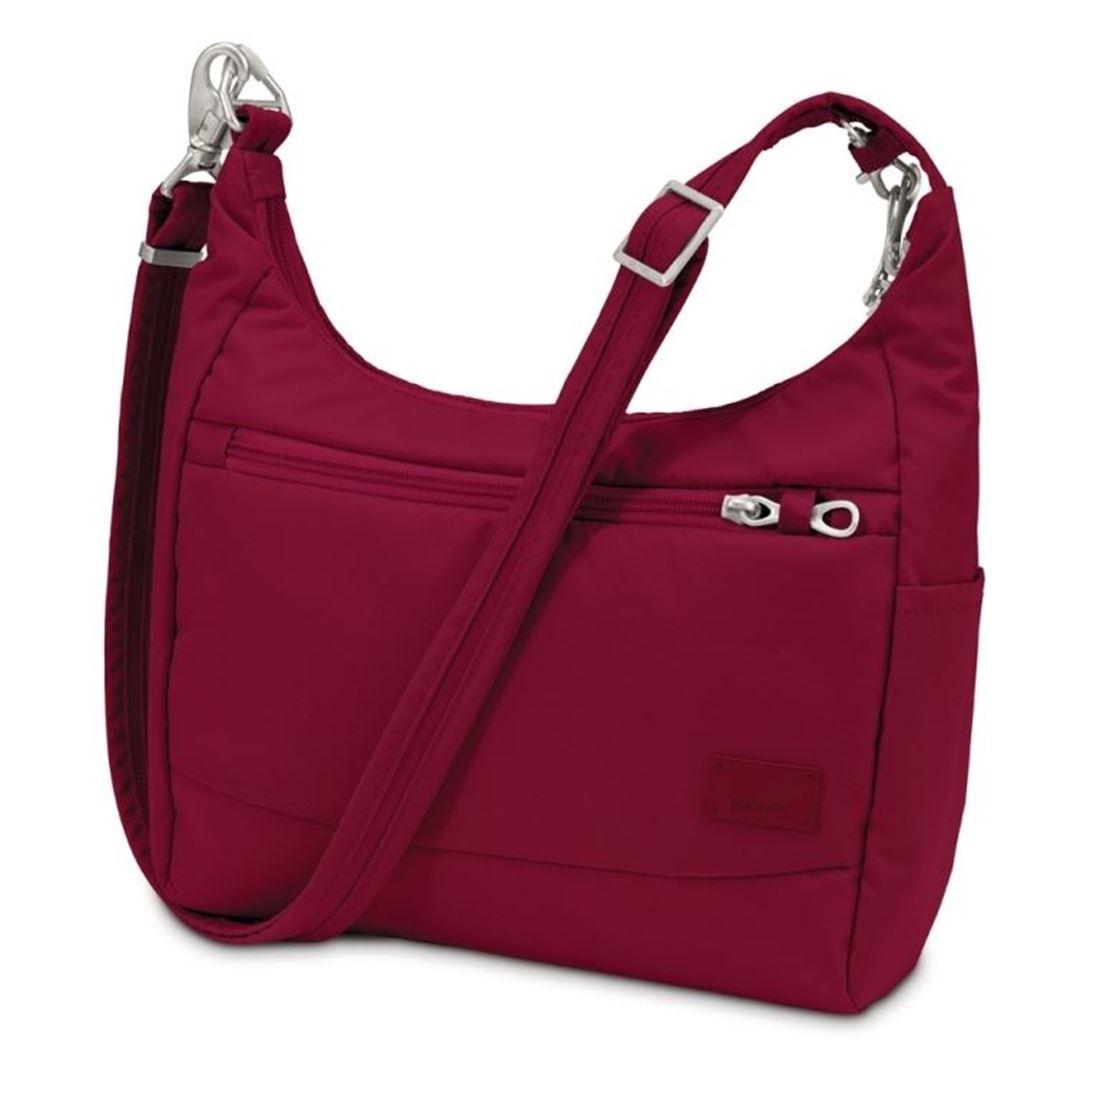 Picture of Pacsafe Citysafe CS100 Travel Handbag  Cranberry